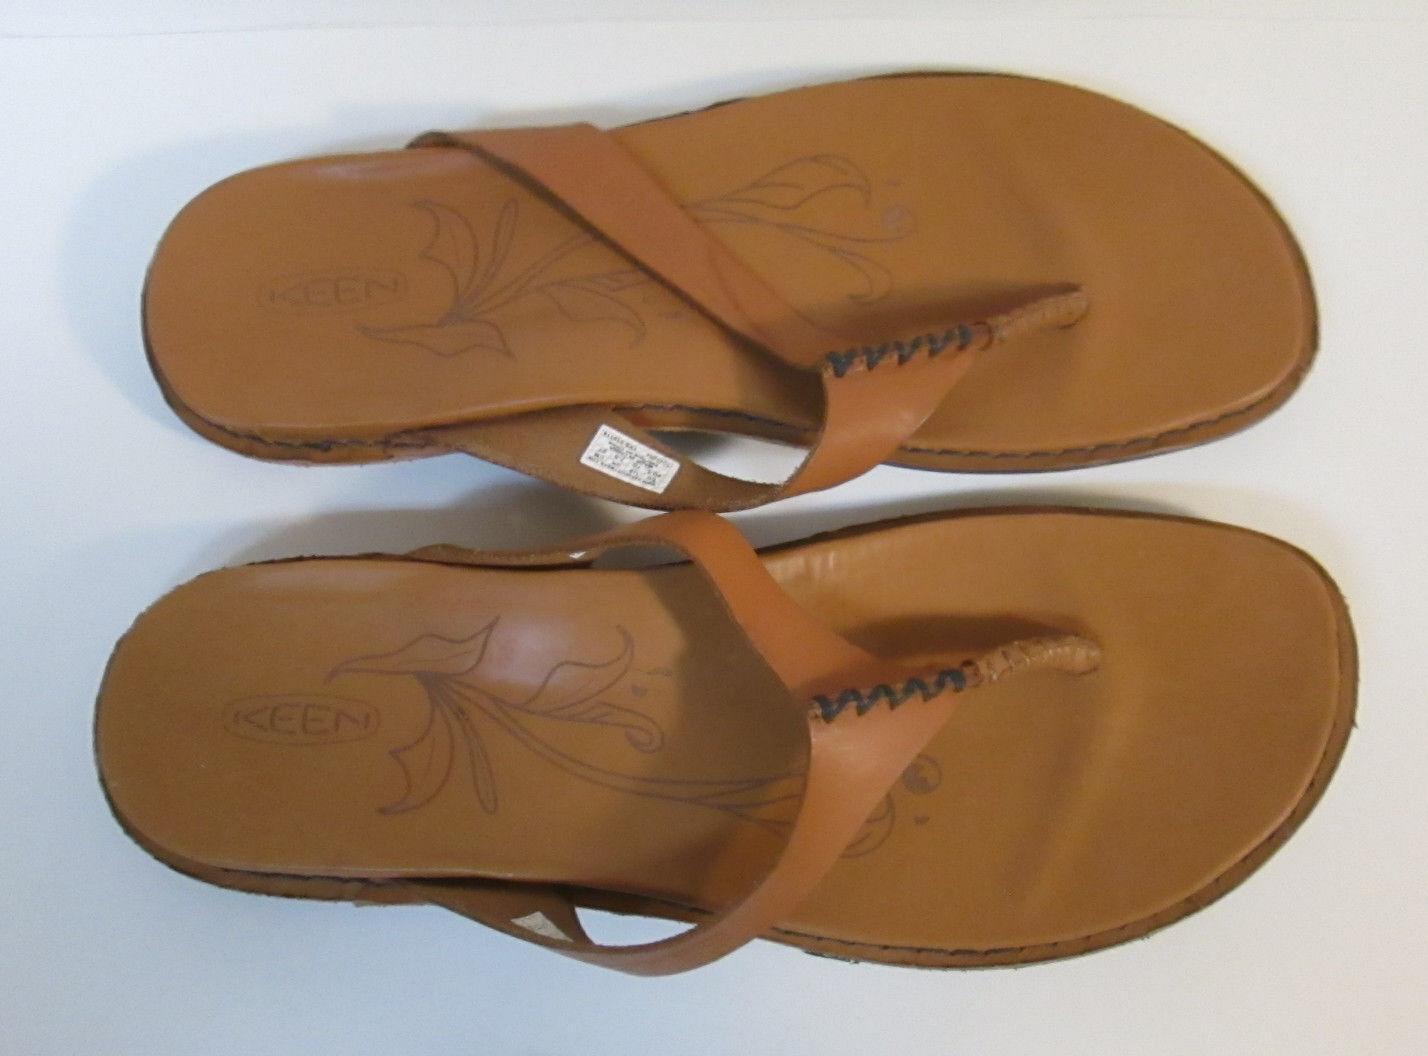 KEEN Womens sz 10 Cymbal Tan Alman Flip Flop Leather Casual Sandals Flats shoes